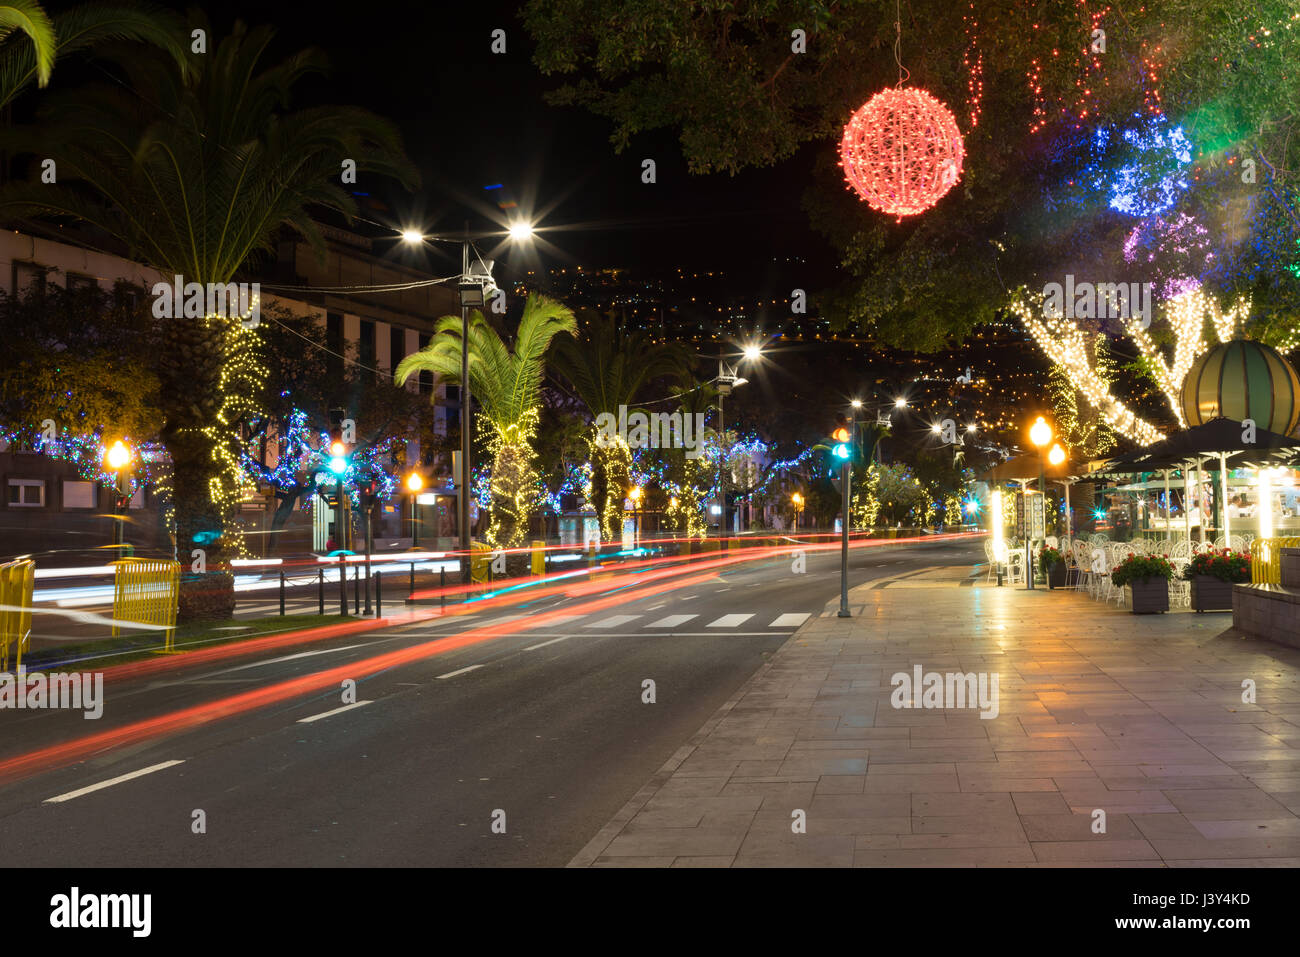 Festival street lights on Avenida do Mar, Funchal, Madeira Stock Photo